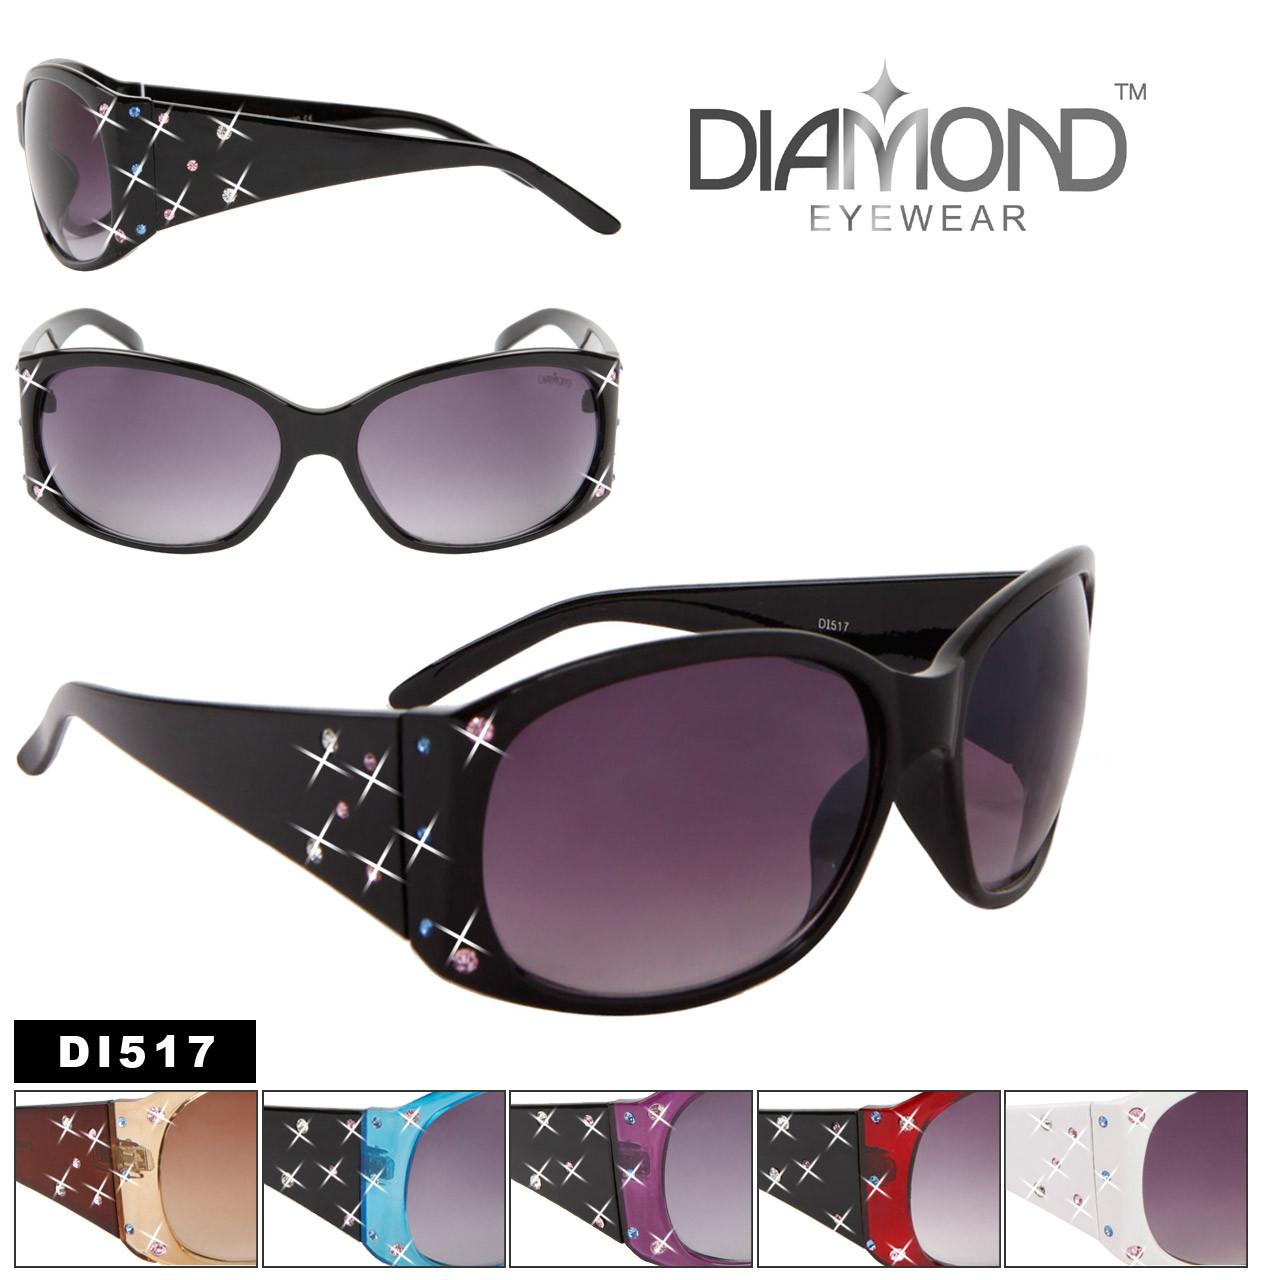 Wholesale Replica Sunglasses for Women with Rhinestones